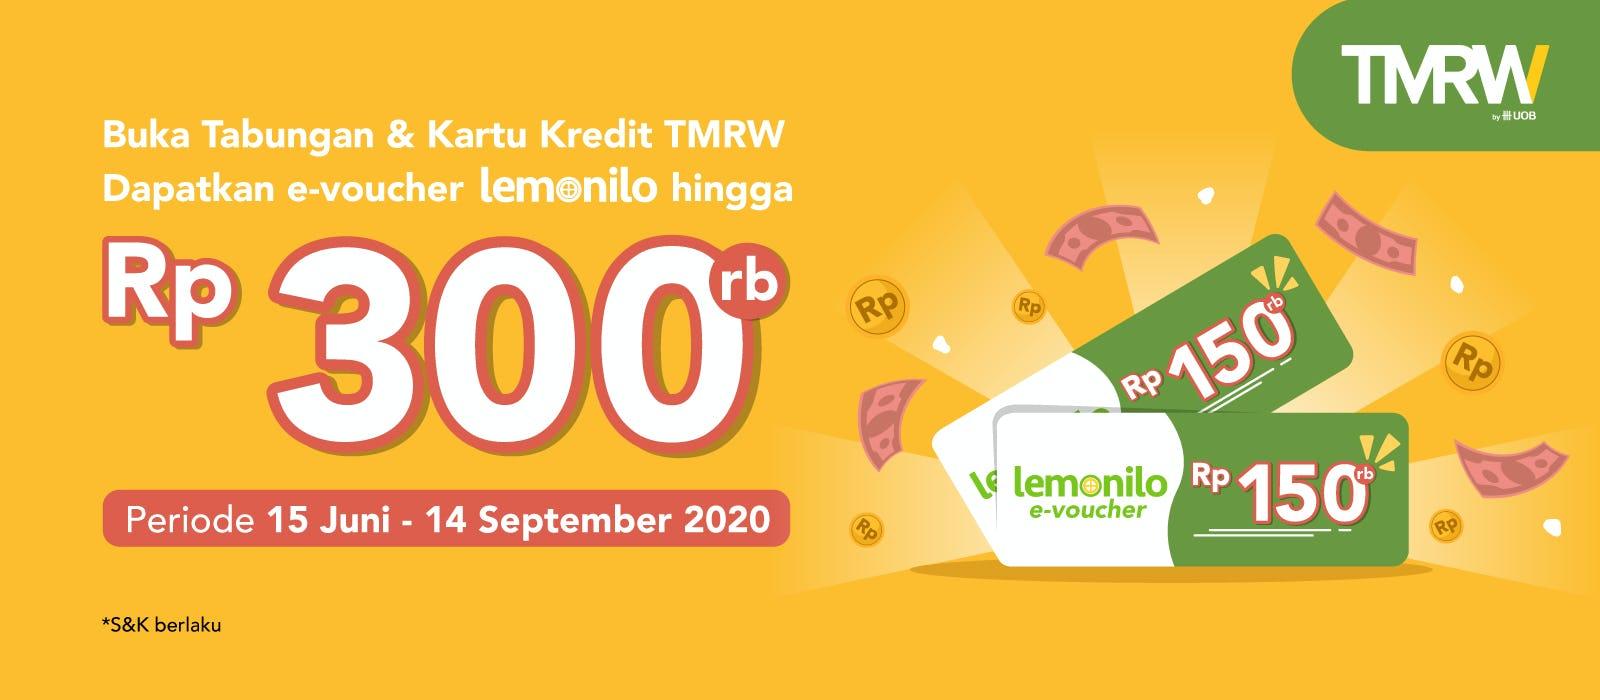 Buka Tabungan & Kartu Kredit TMRW Dapat E-Voucher Lemonilo